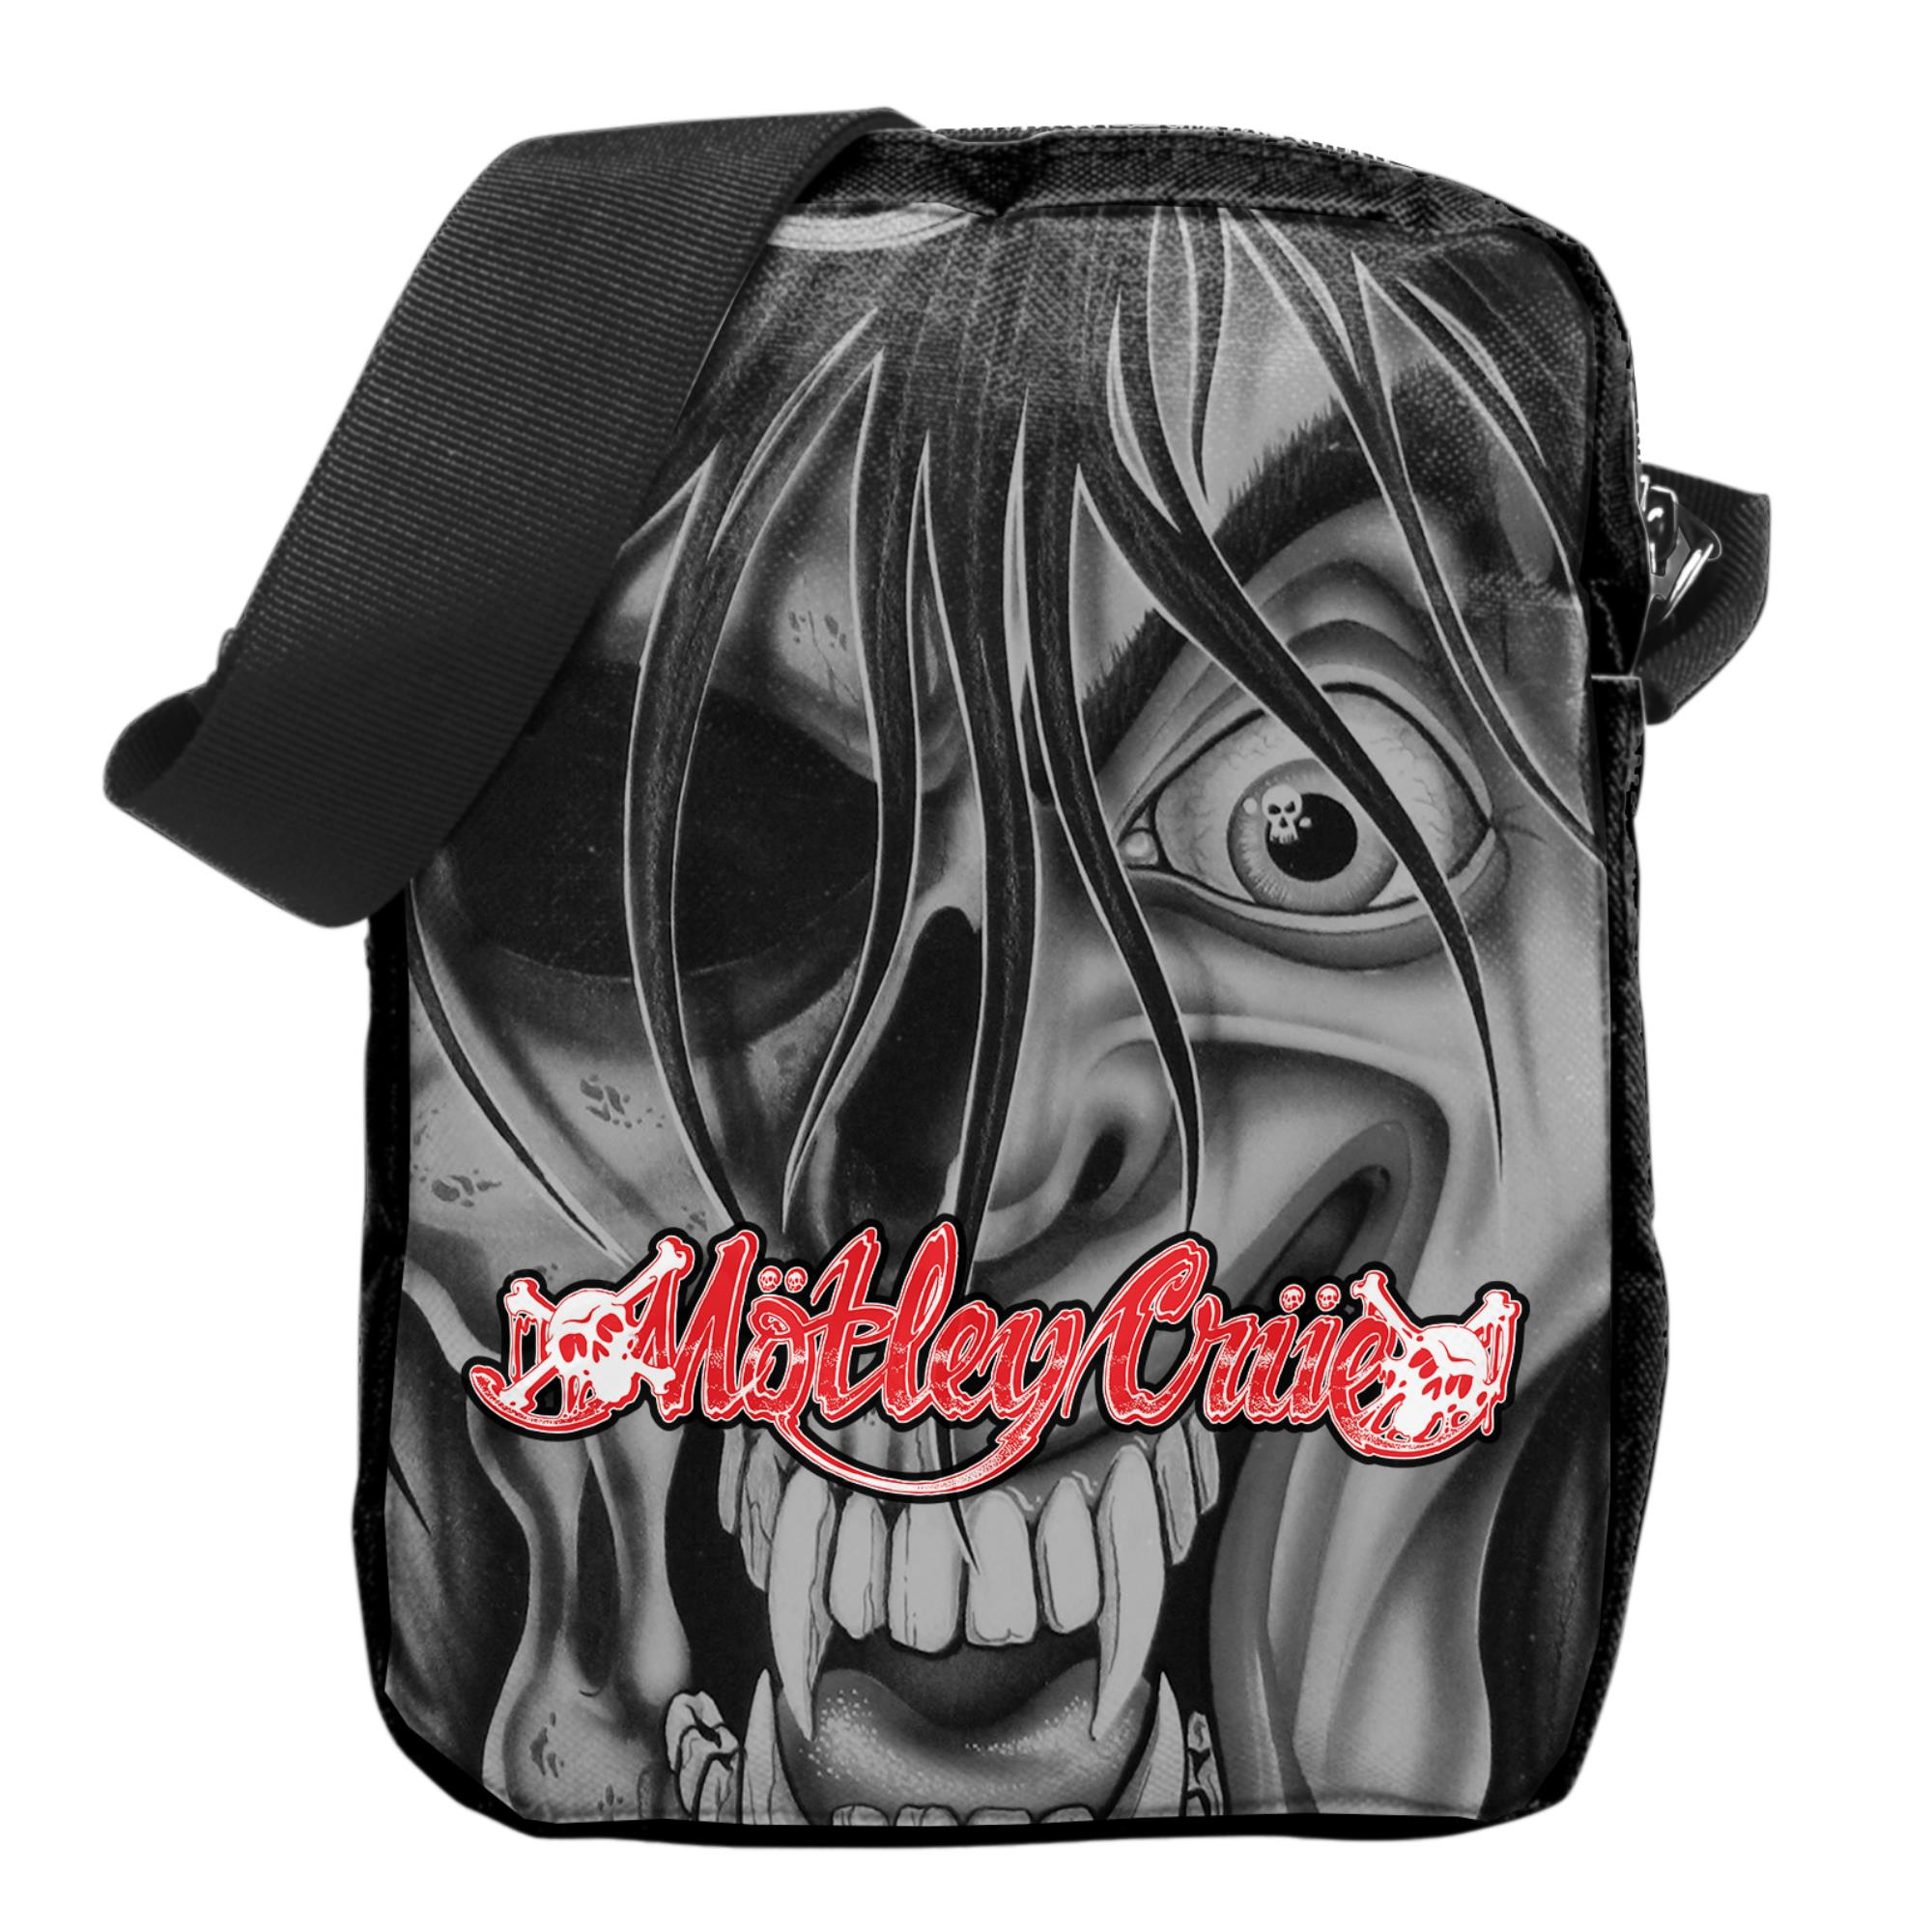 Dr. Feelgood Face Crossbody Bag